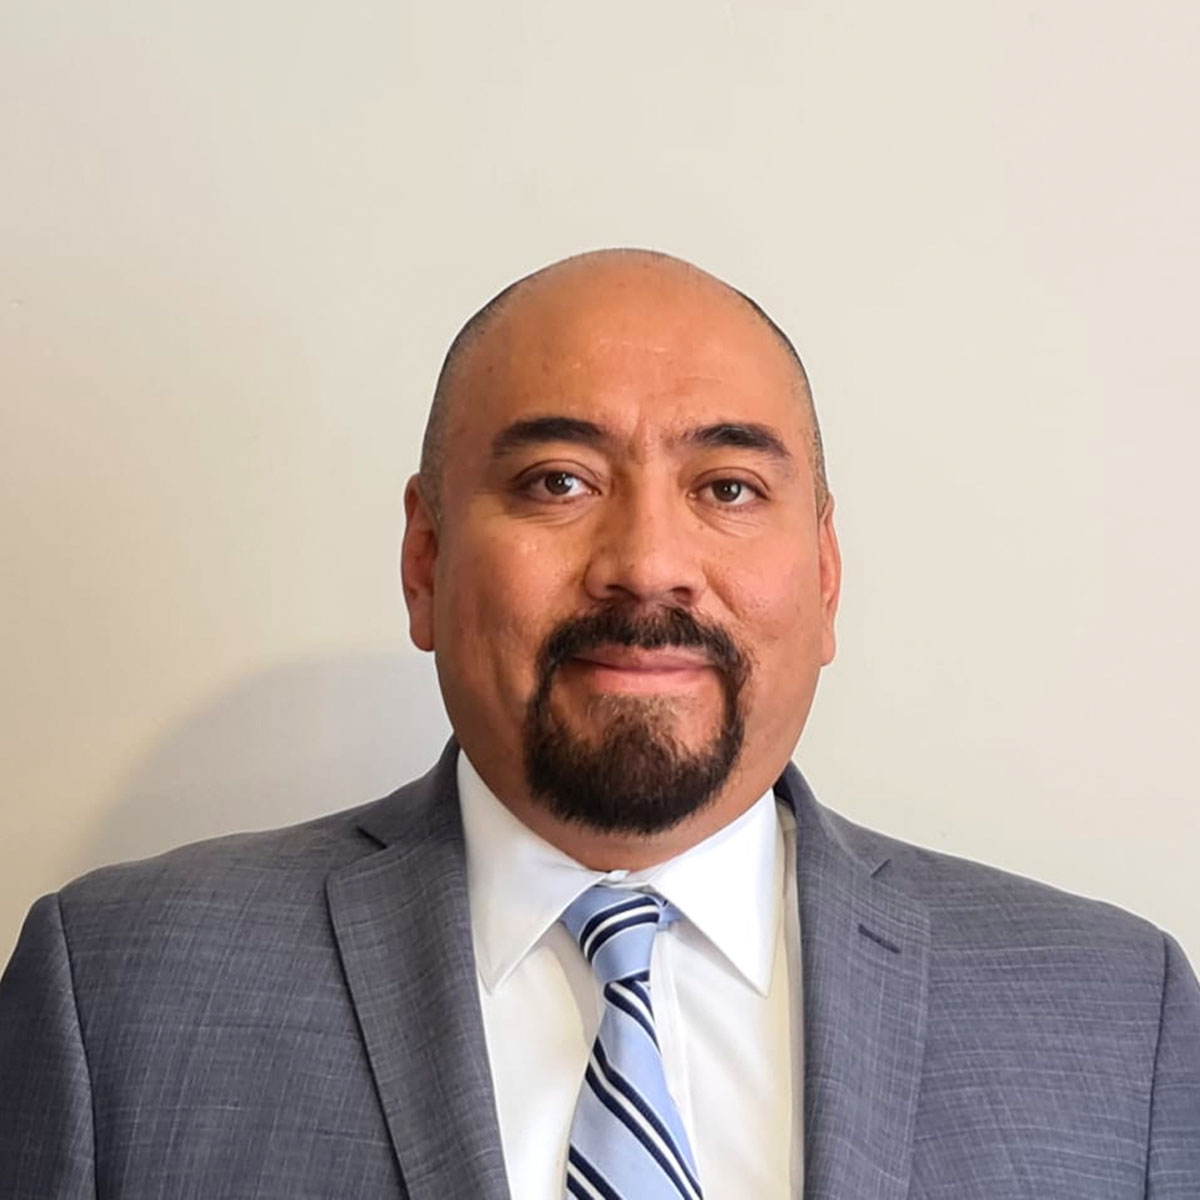 * L.C.C. Miguel Ángel Hernández Yescas